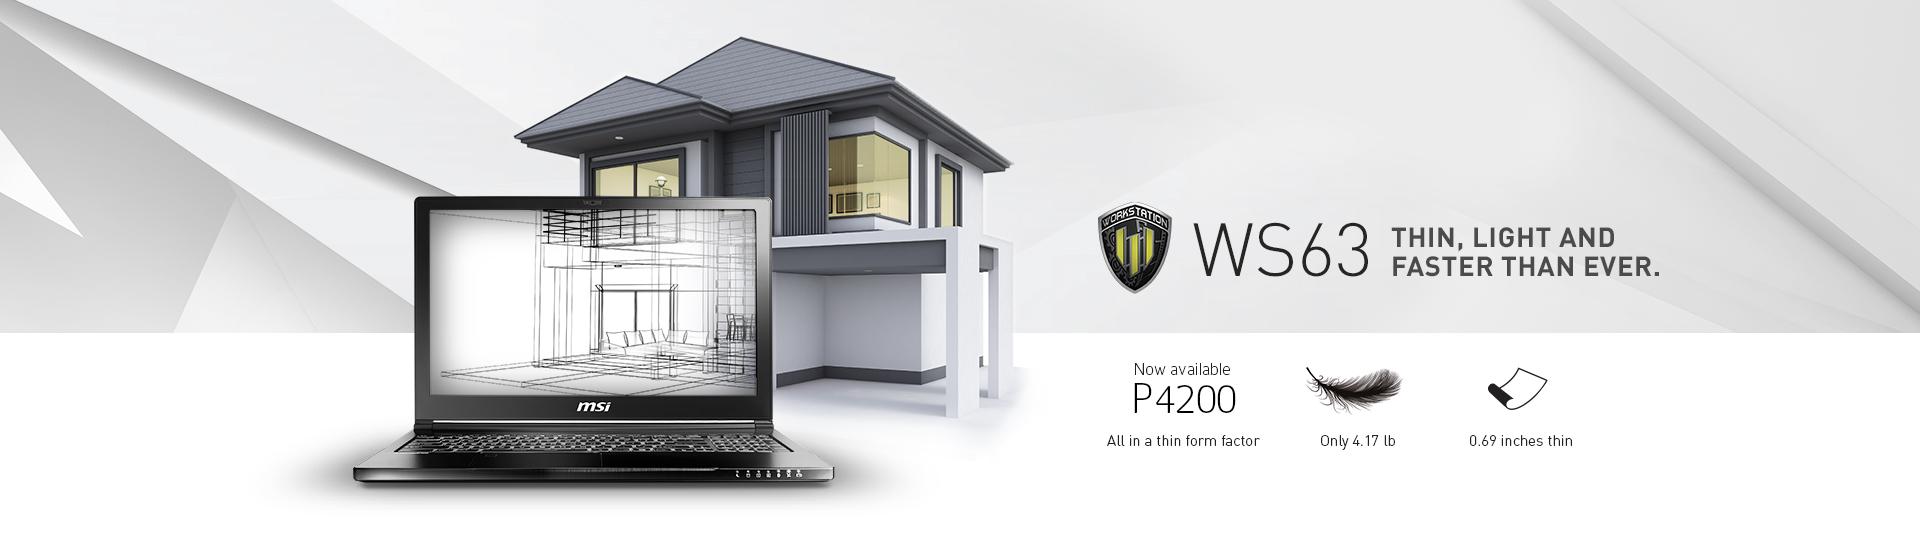 Workstation WS63 - CFL